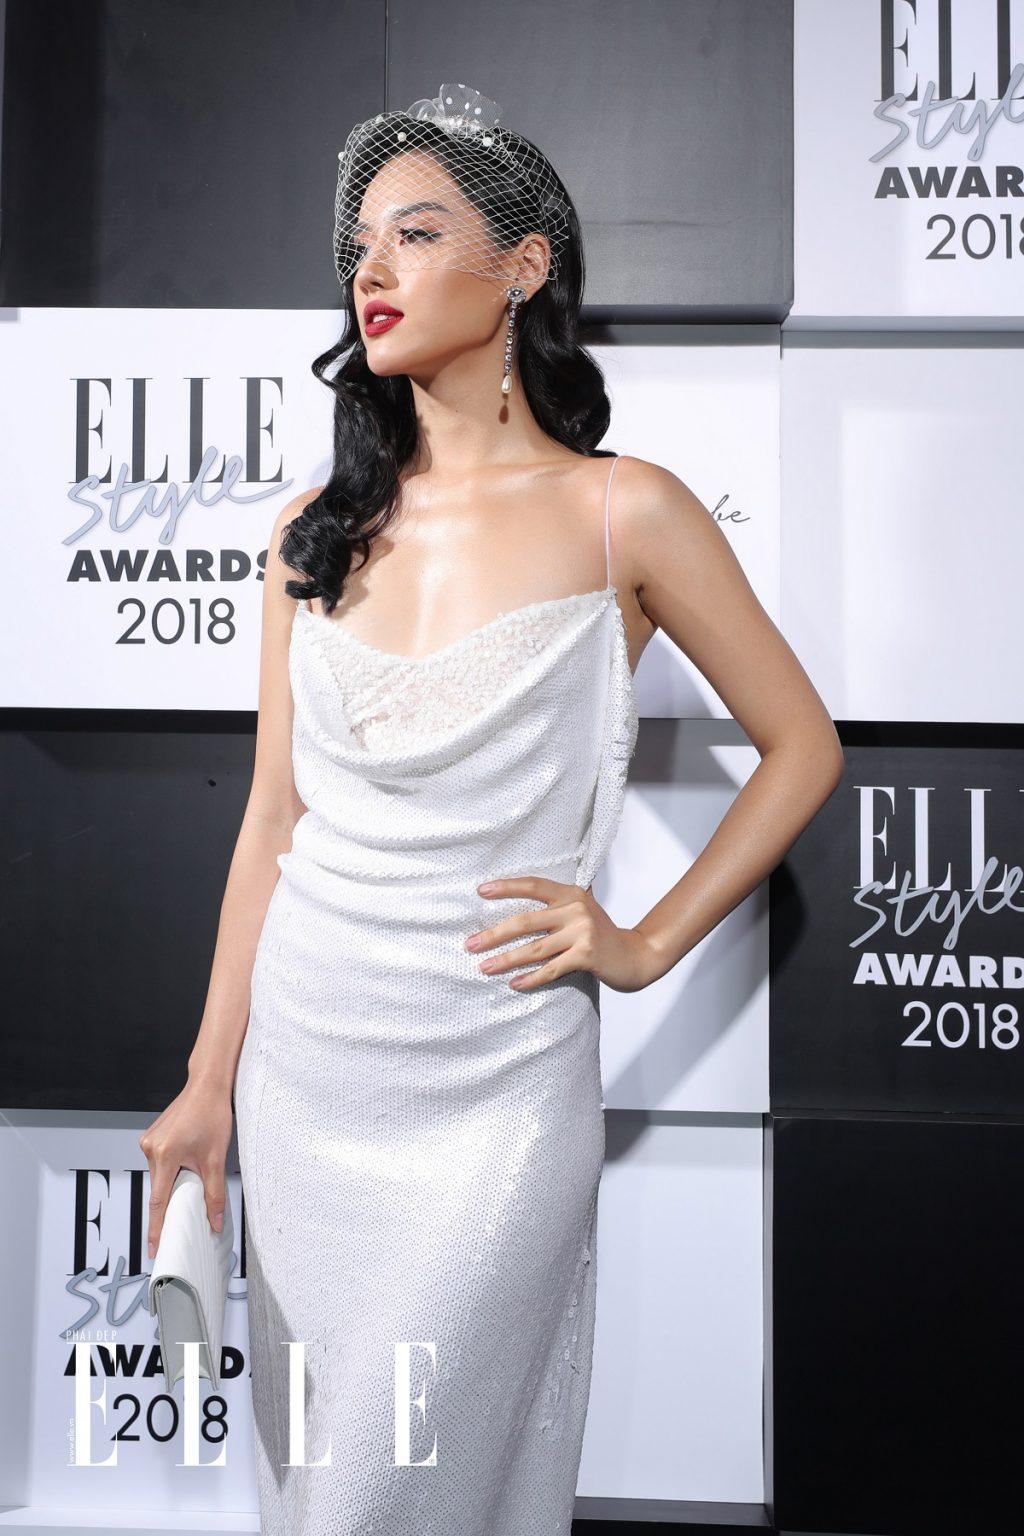 ELLE Style Awards 2018 Khánh Linh The Face